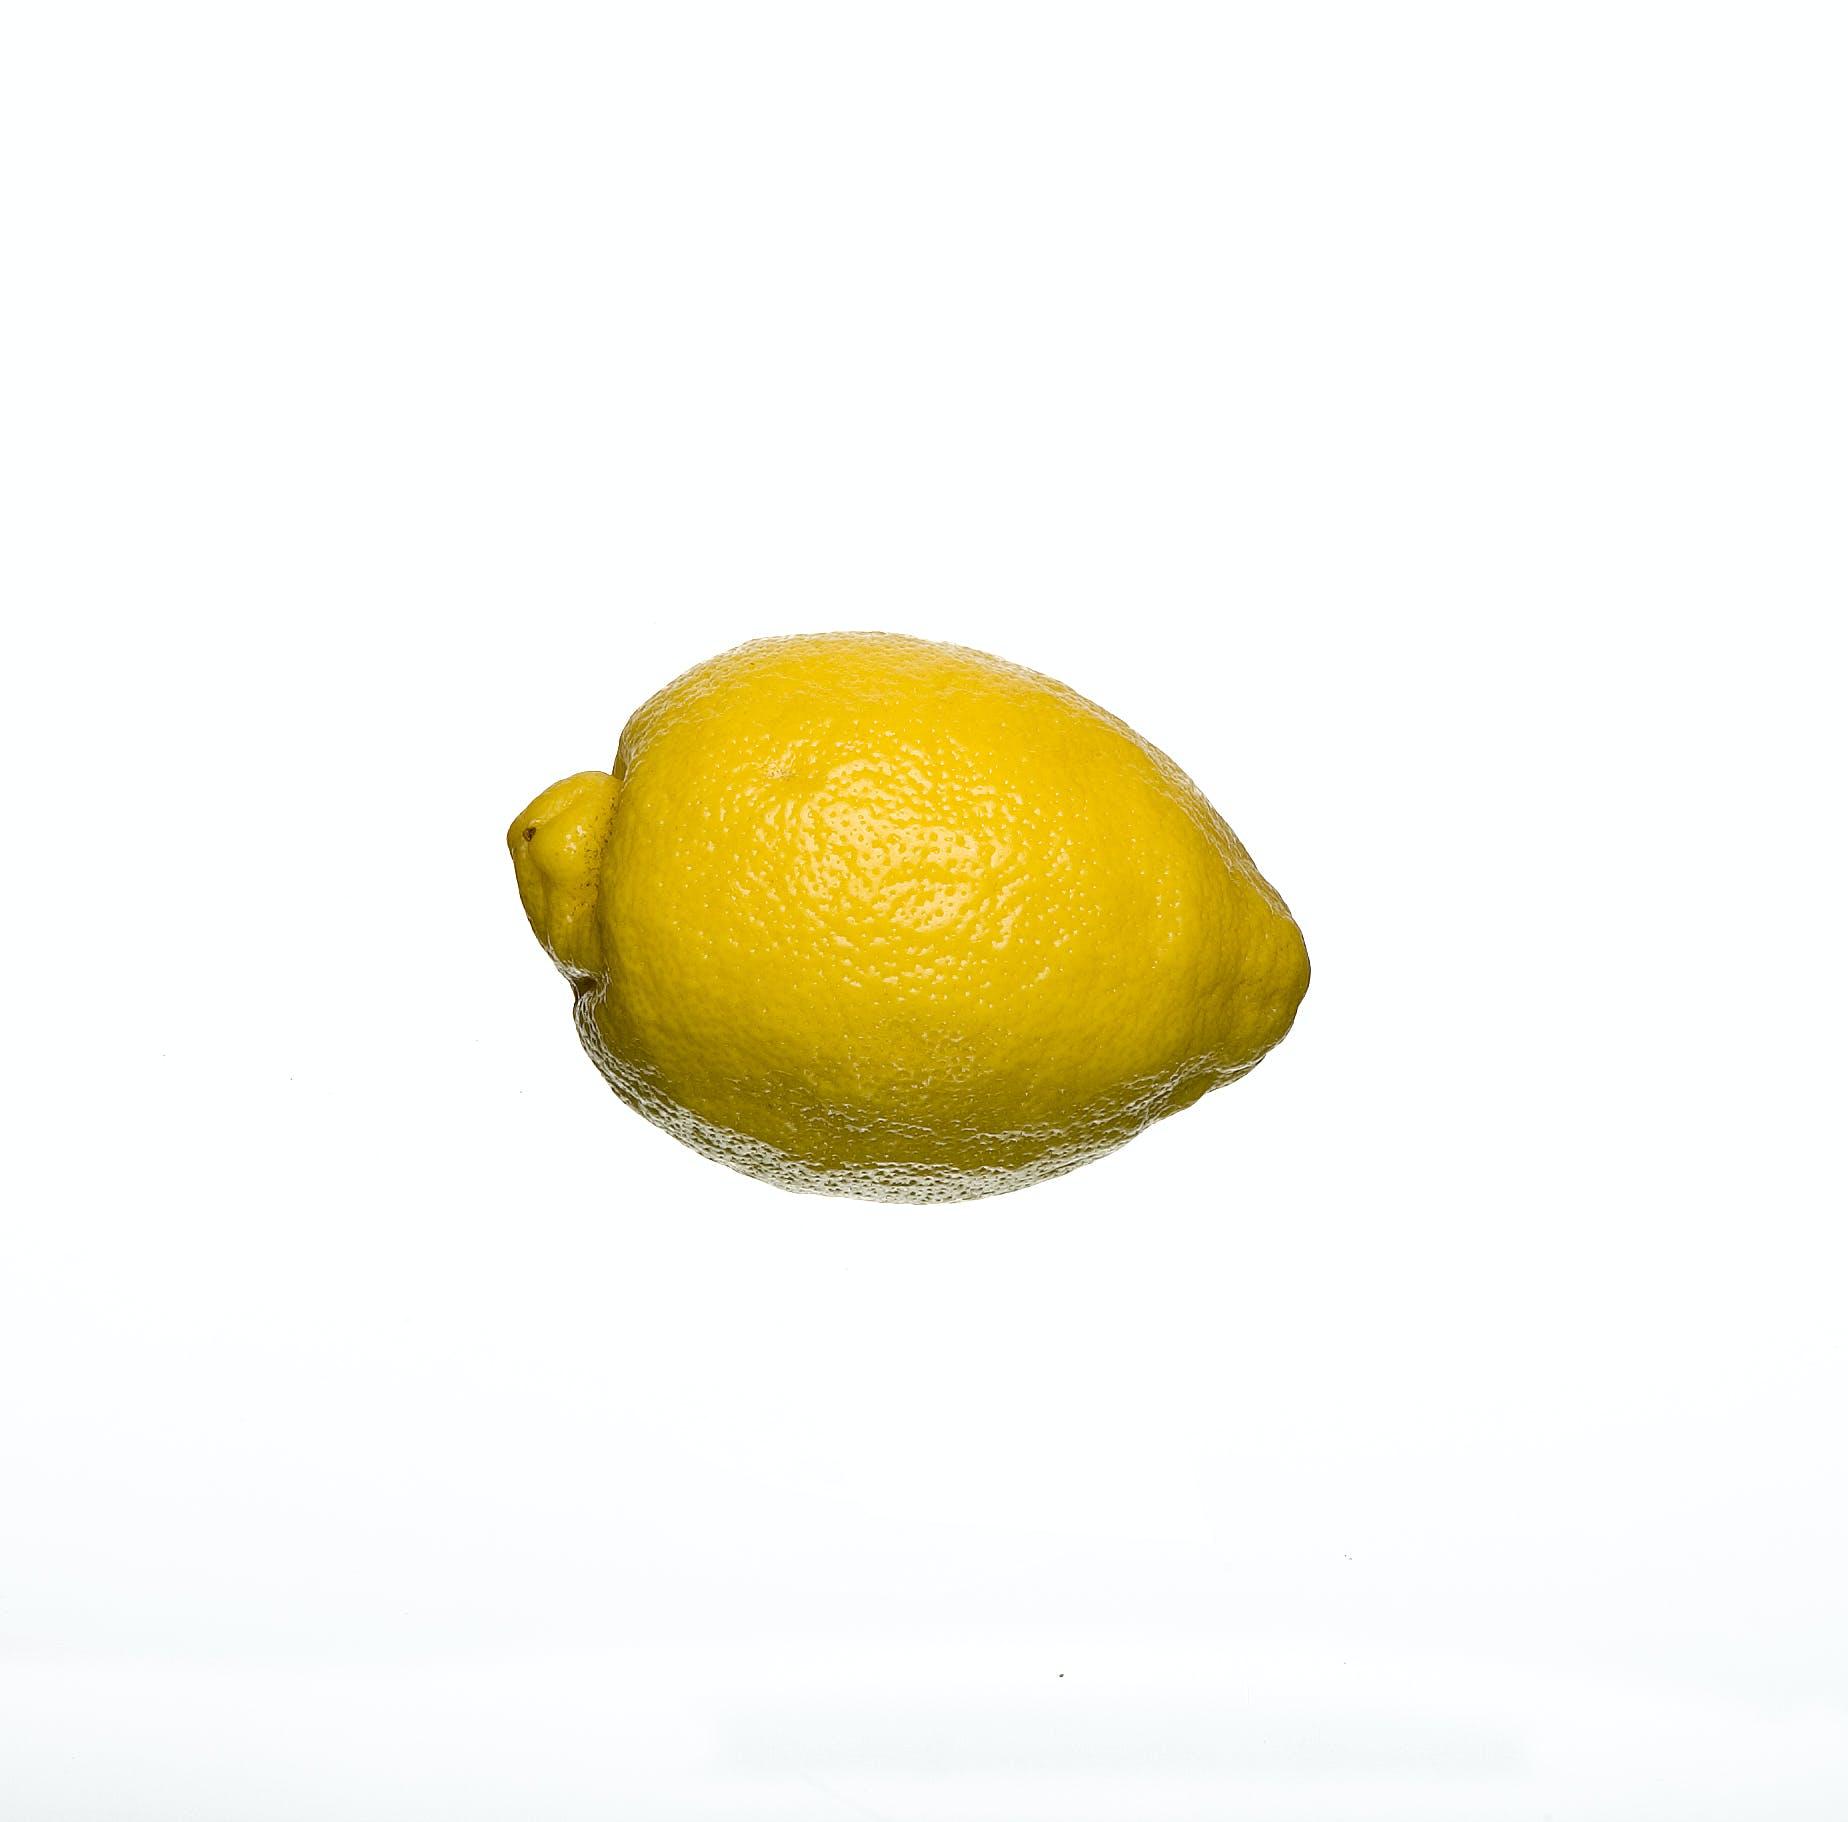 Free stock photo of lemon